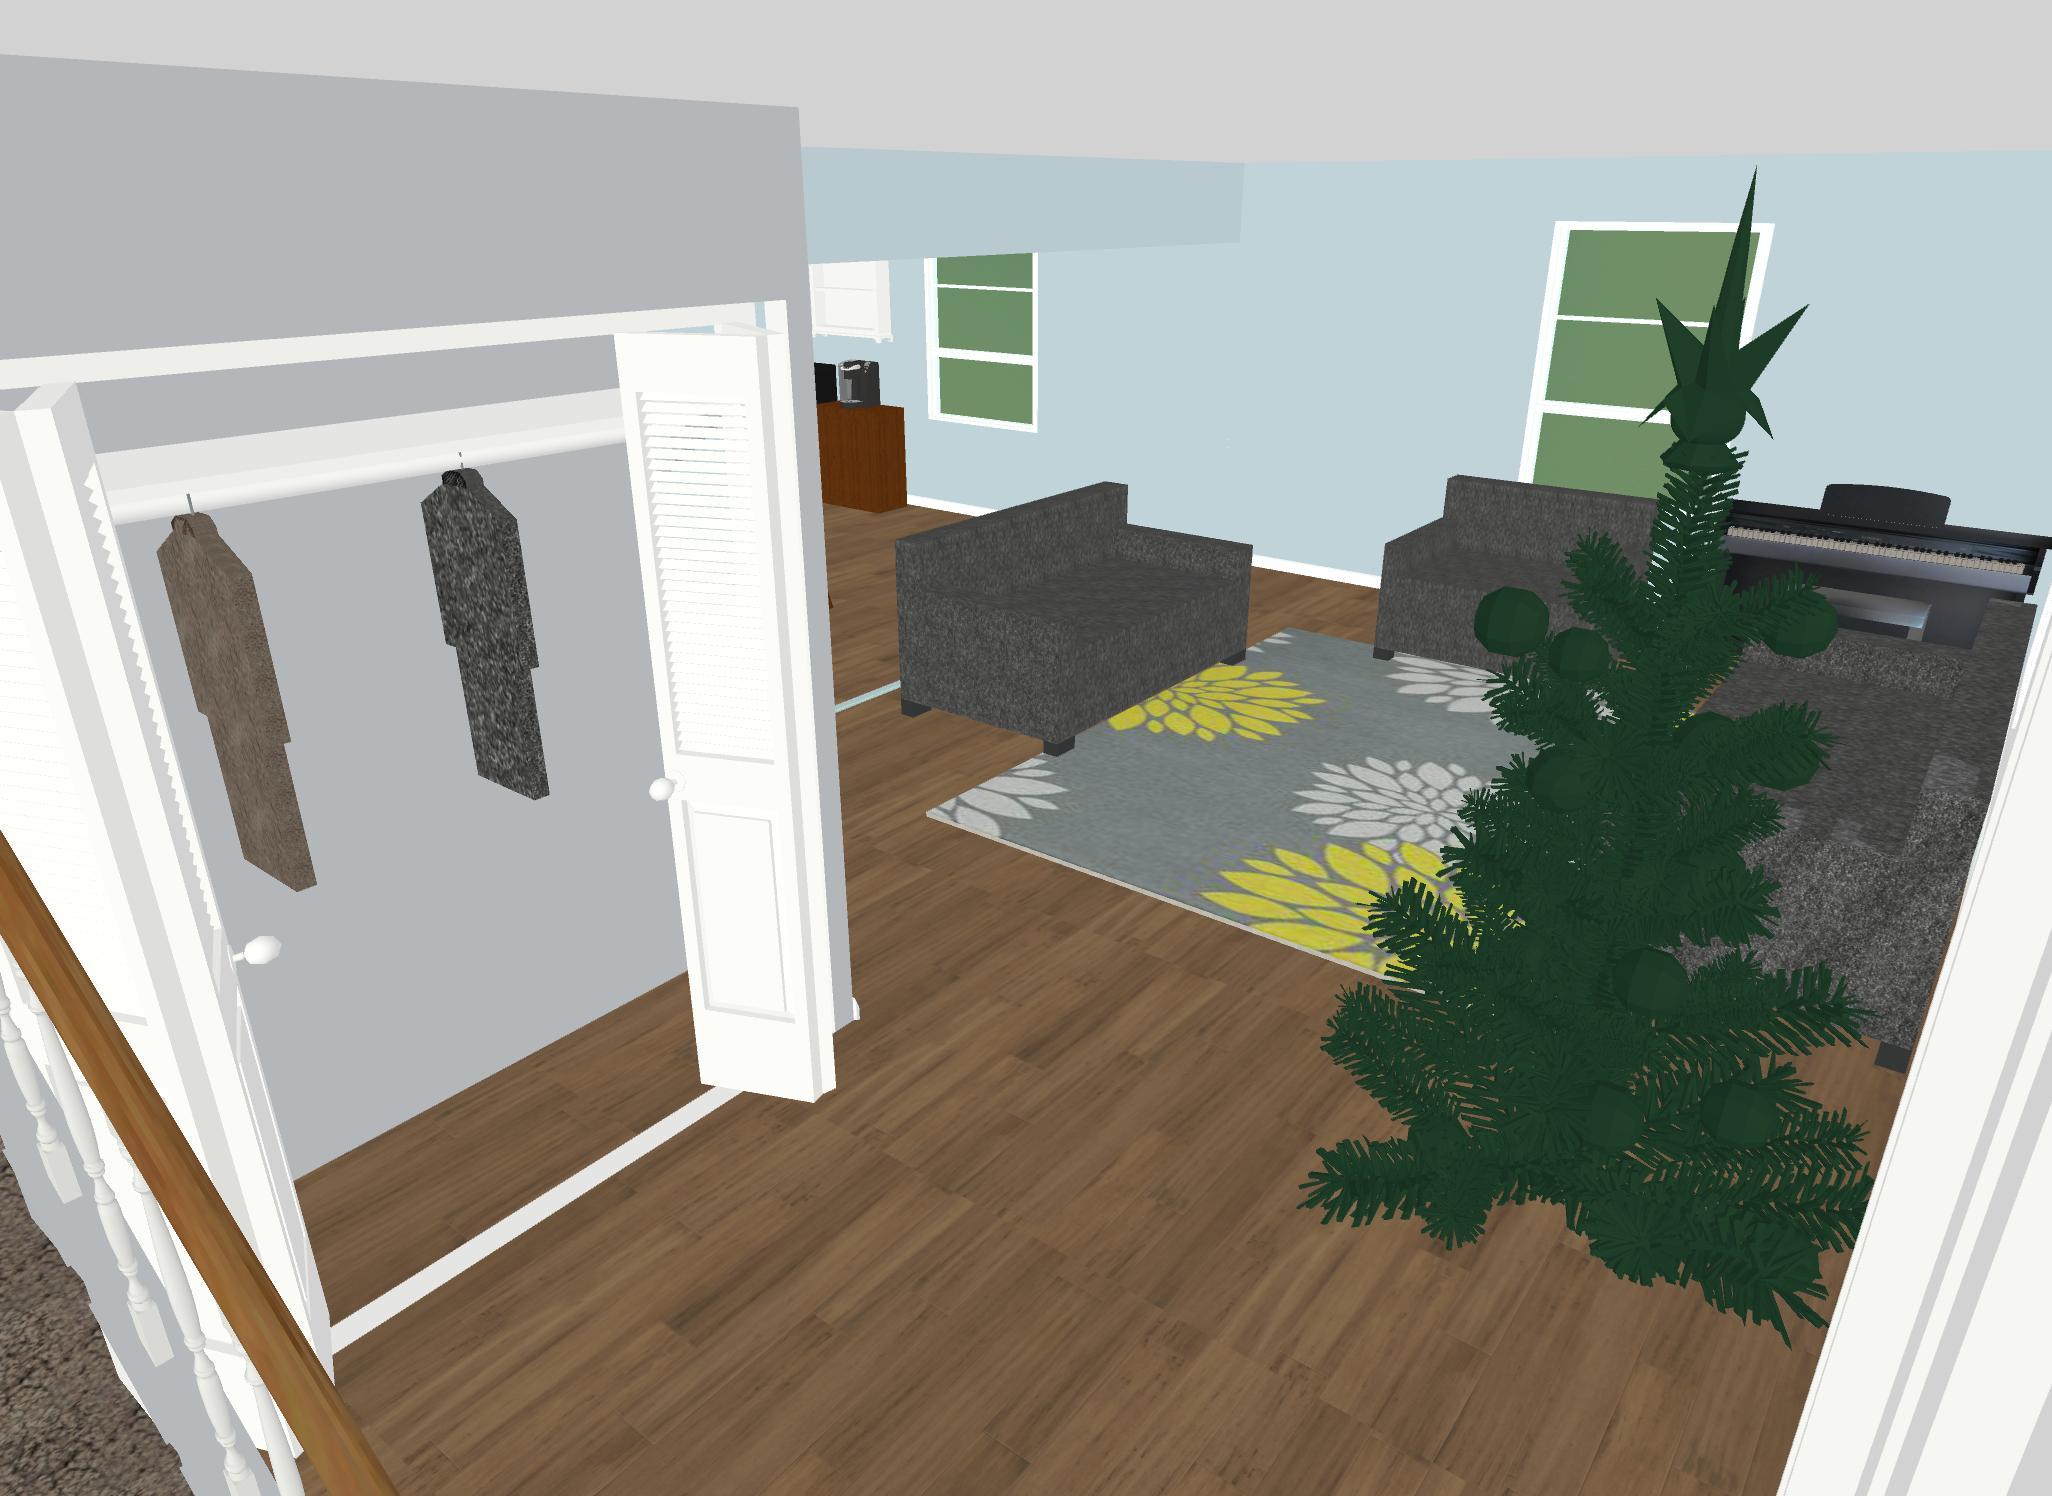 Hallway to Closet